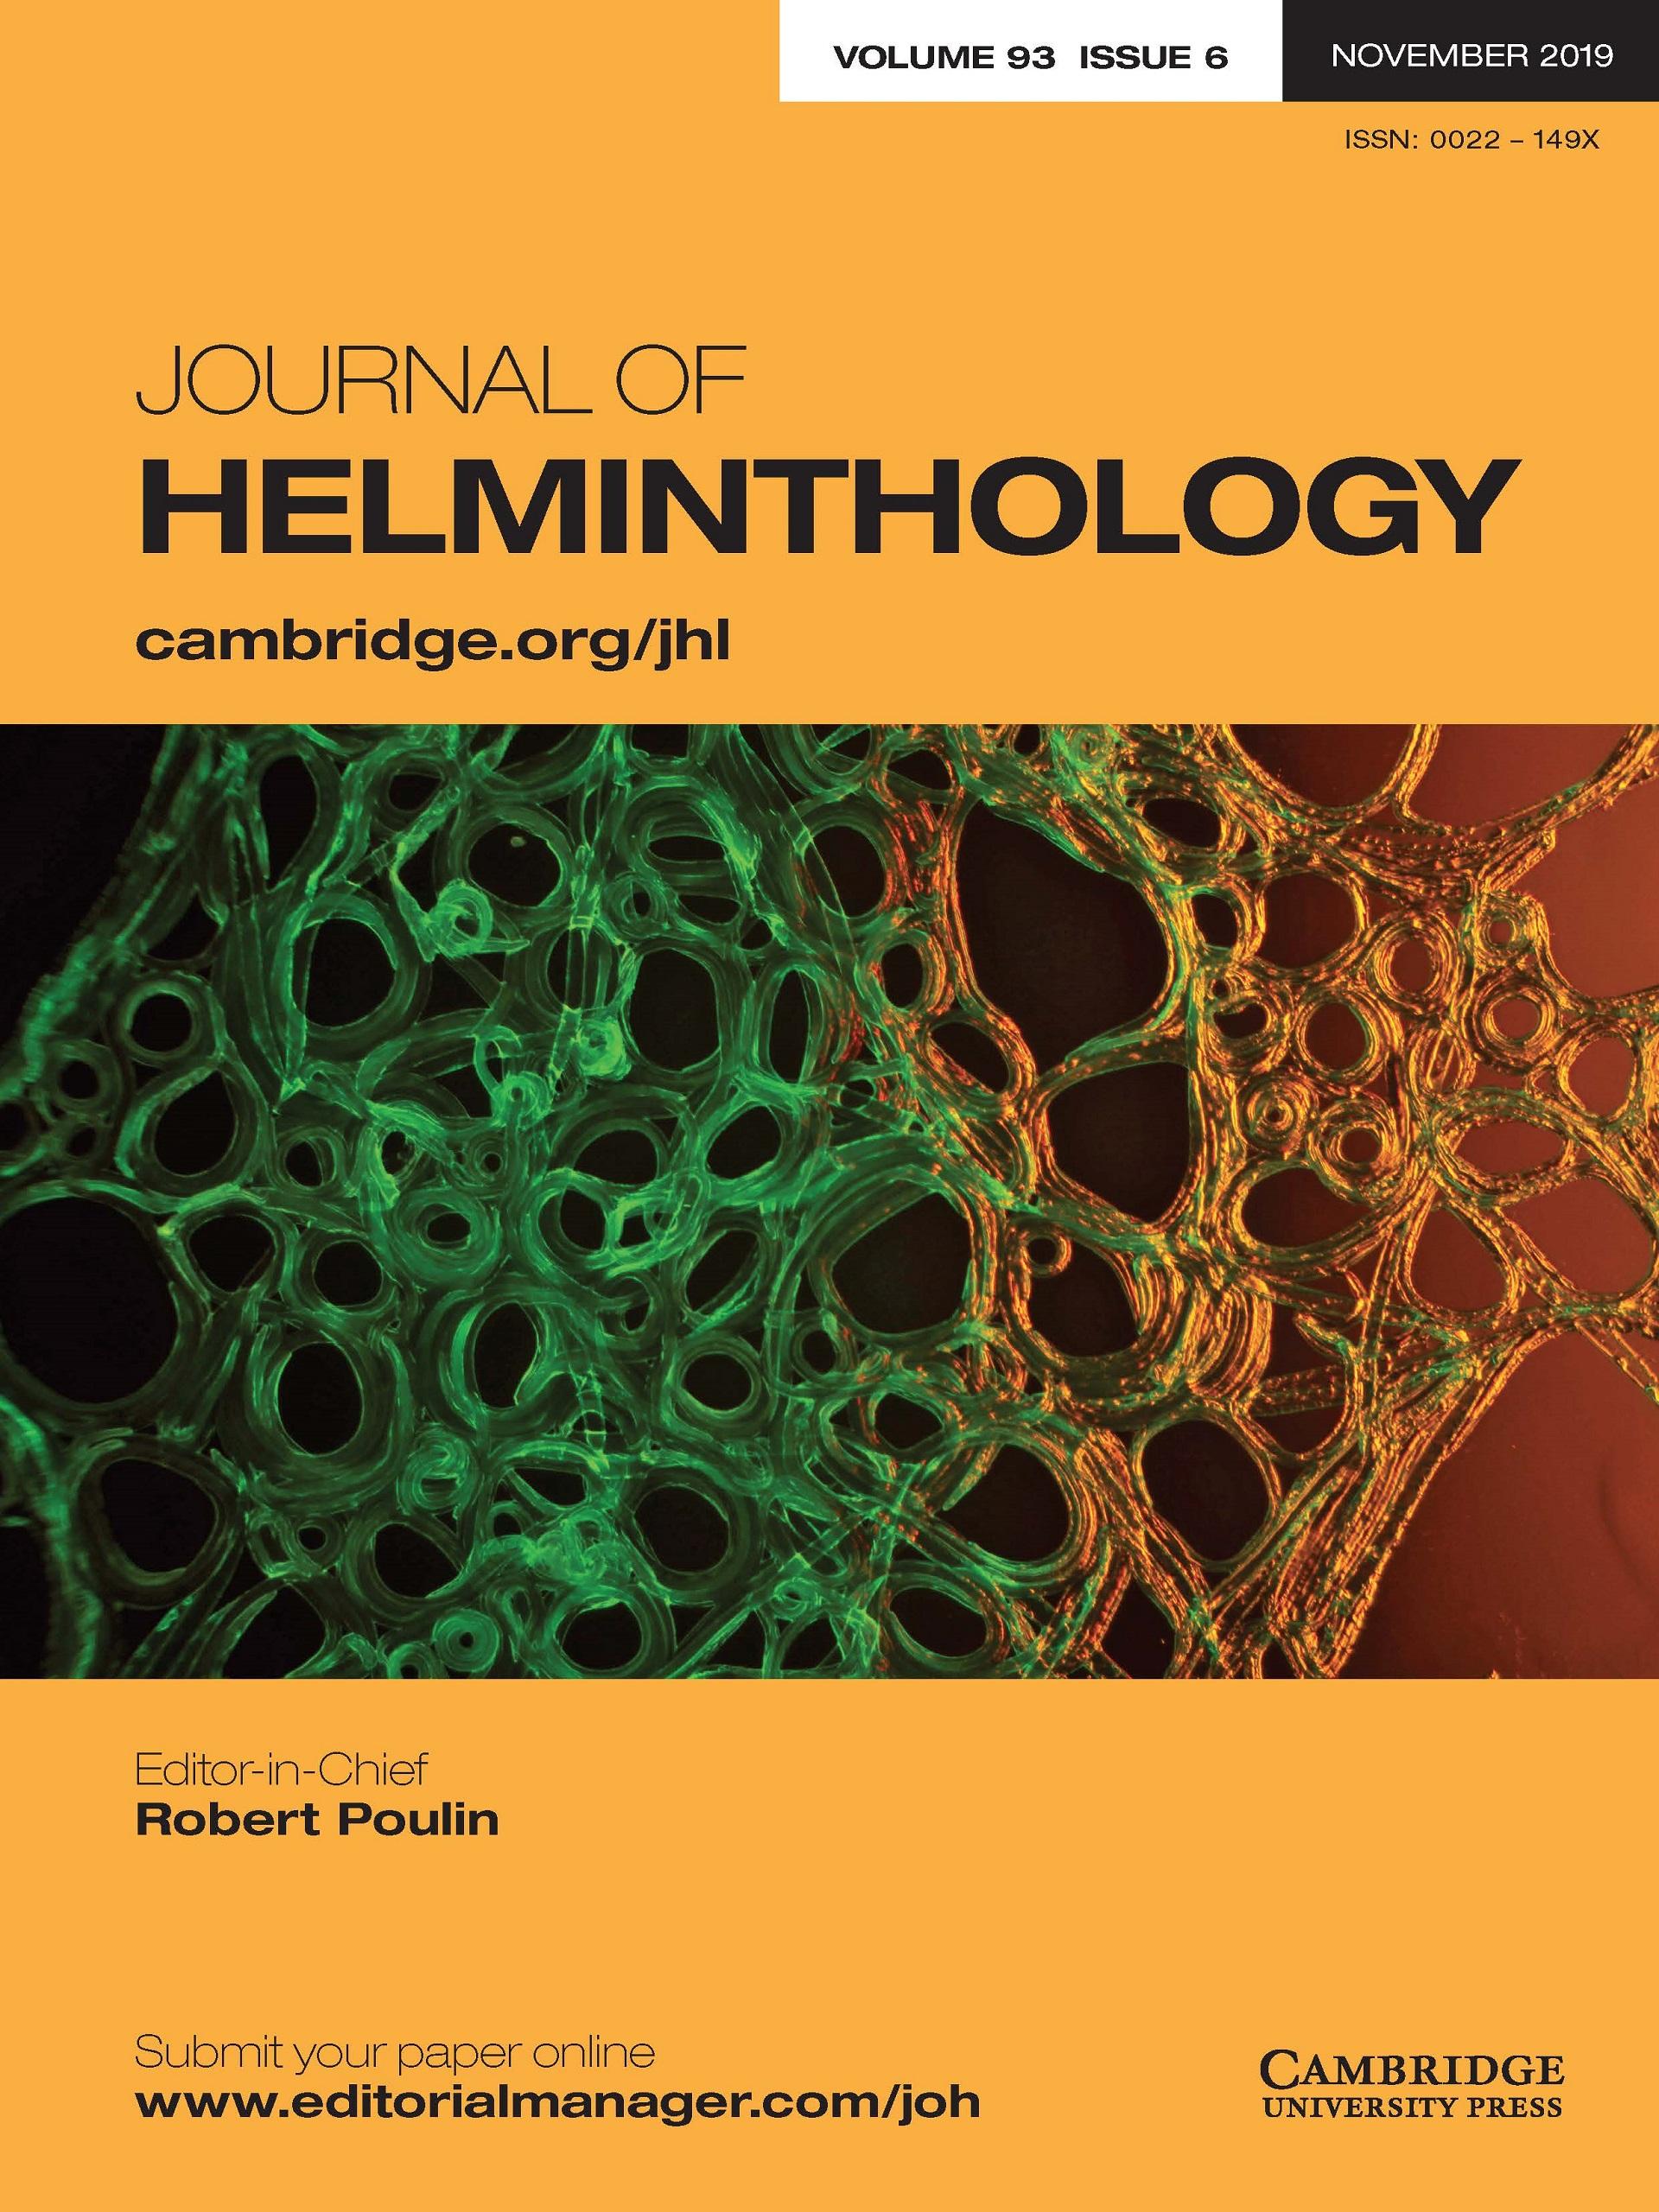 Journal of Helminthology | Cambridge Core